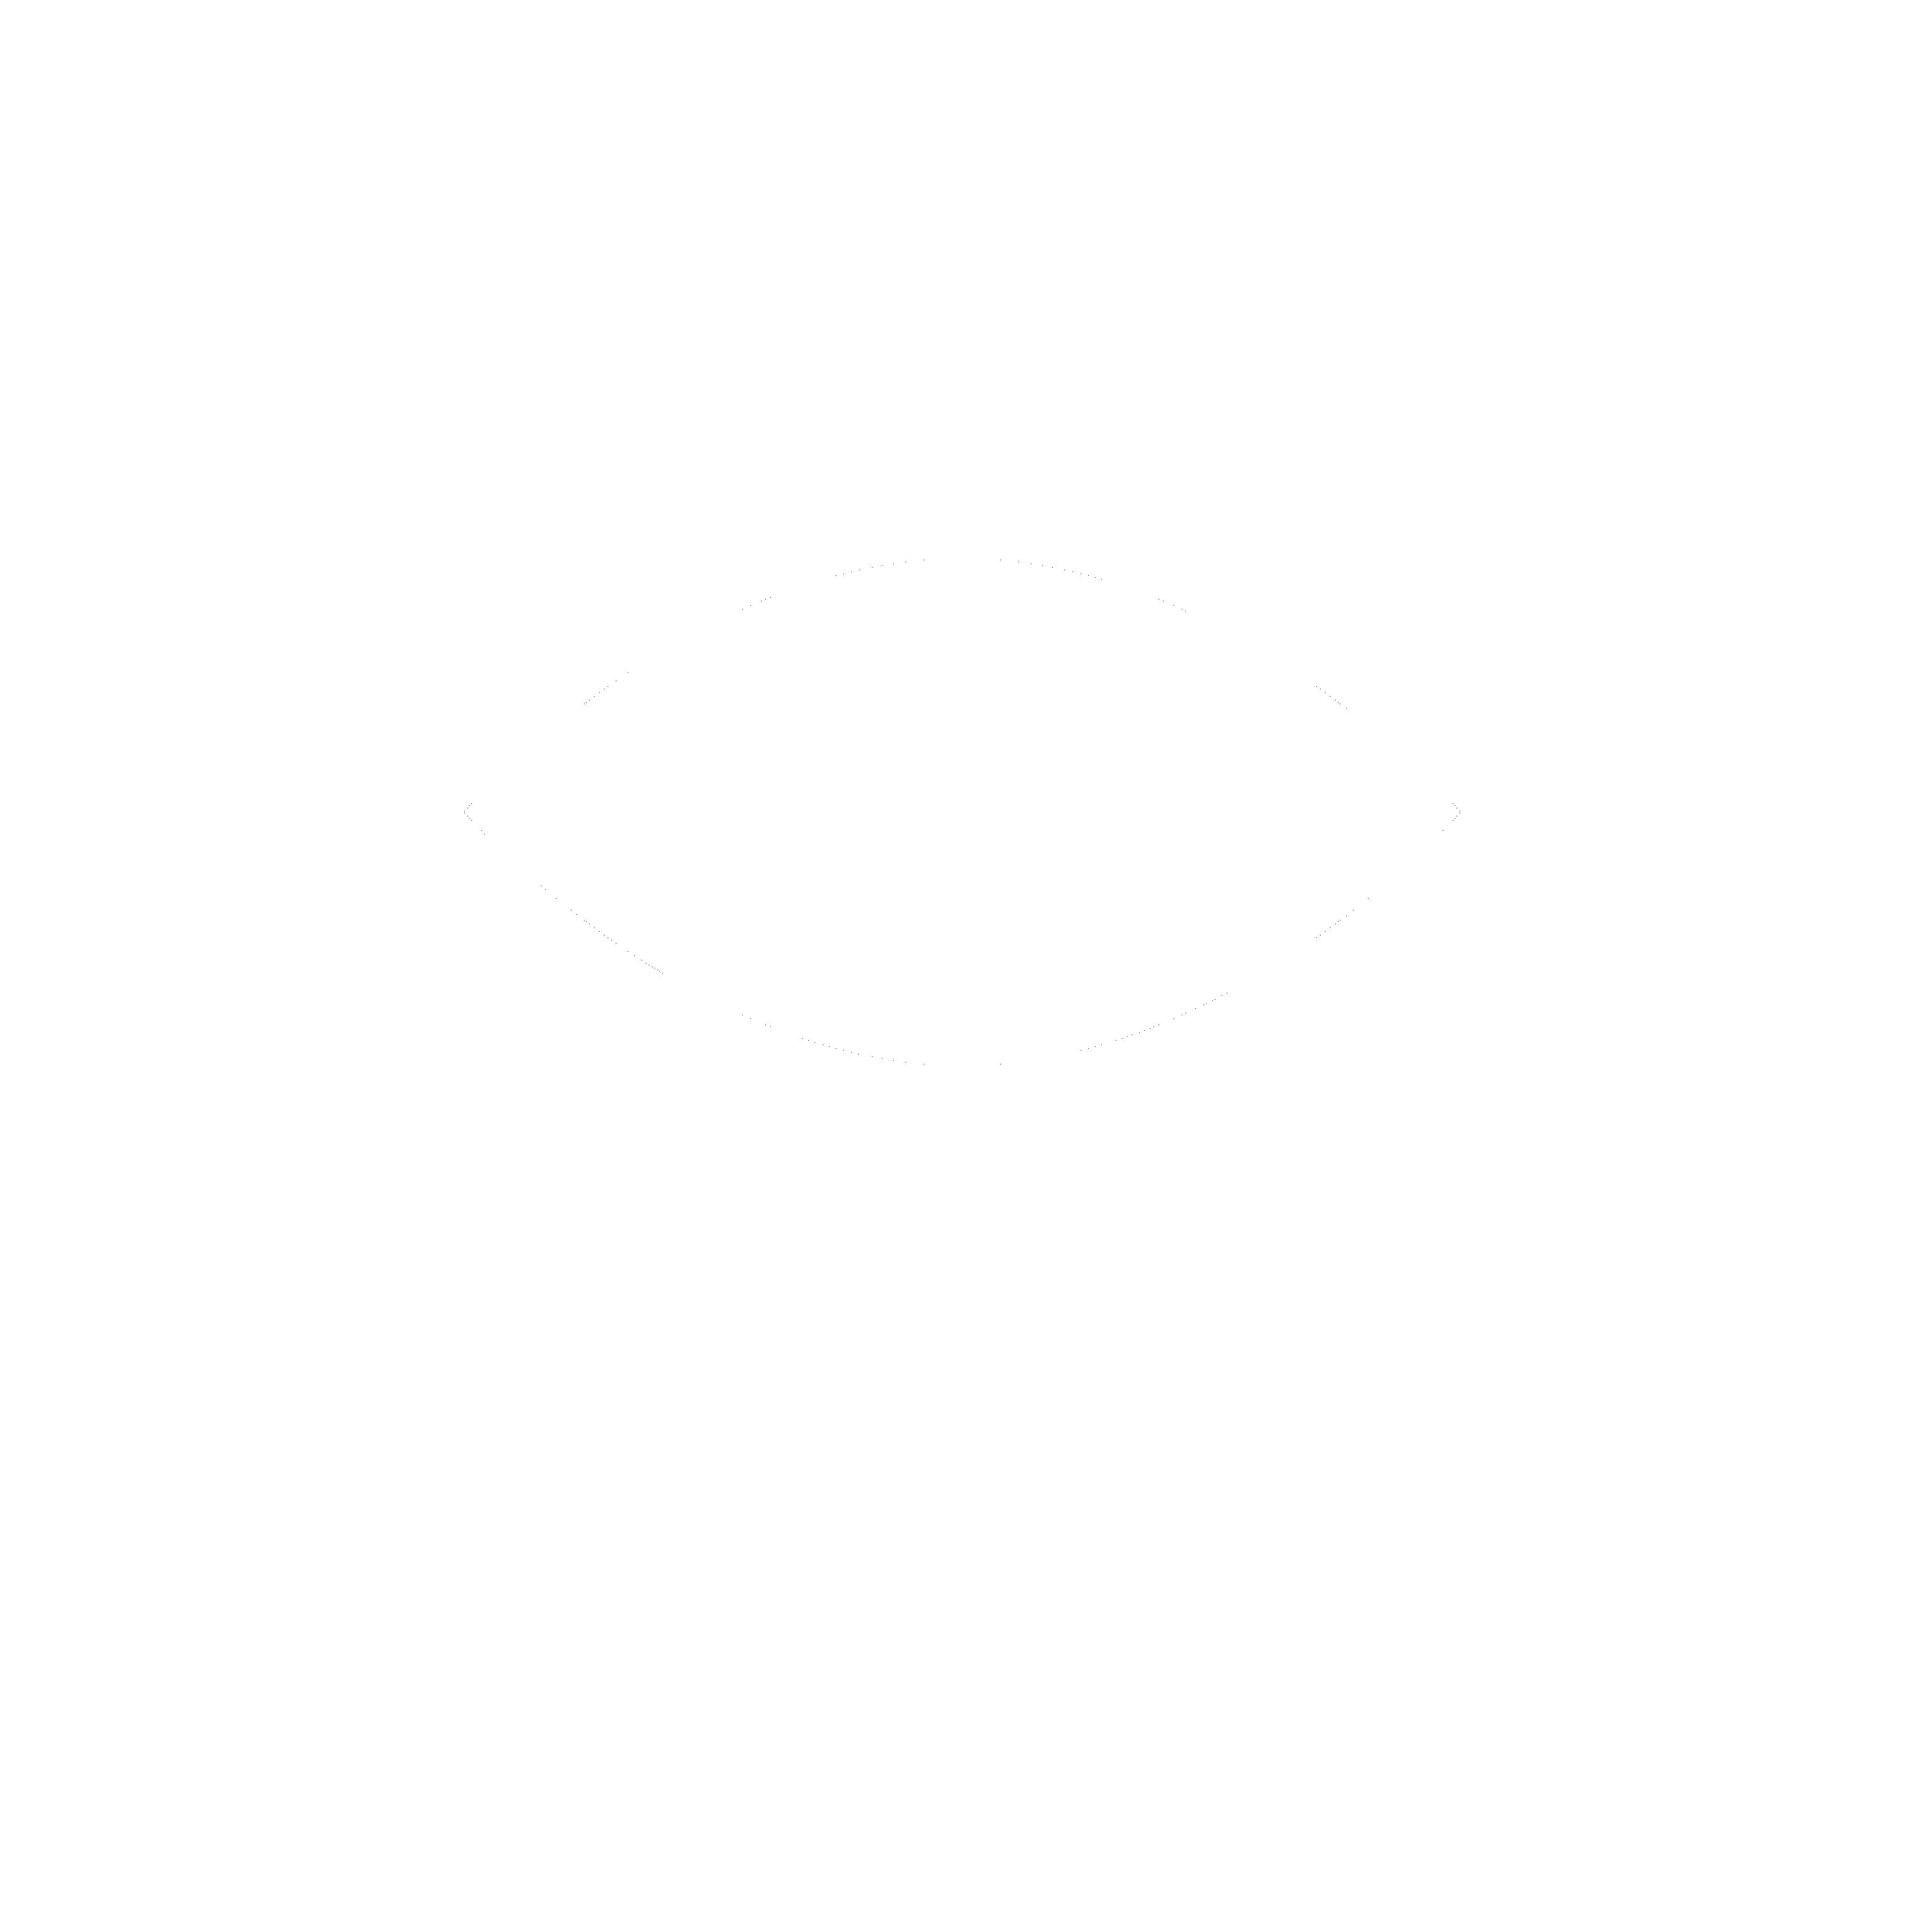 UNAAC_Main_Symbol.png